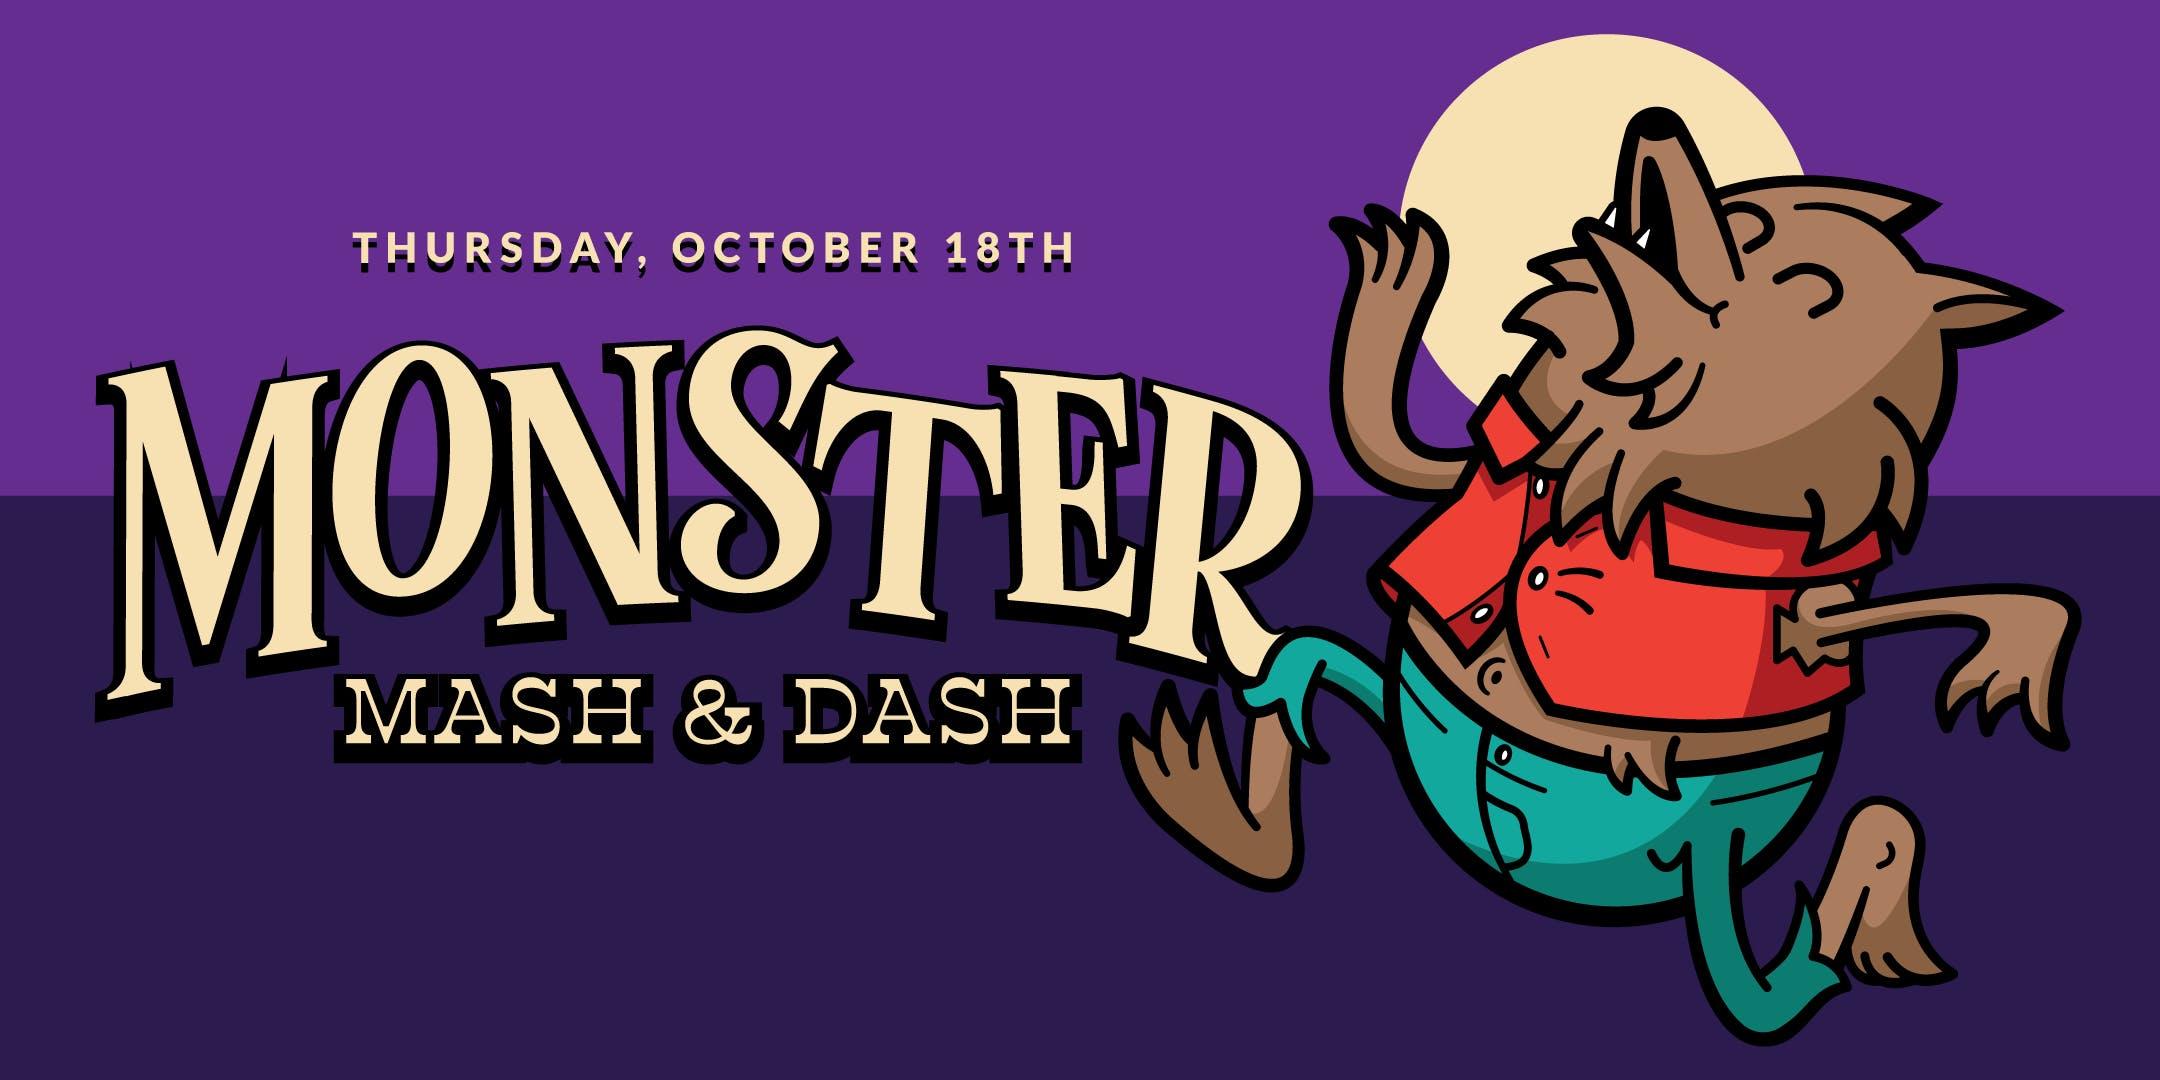 Monster Mash & Dash 2018